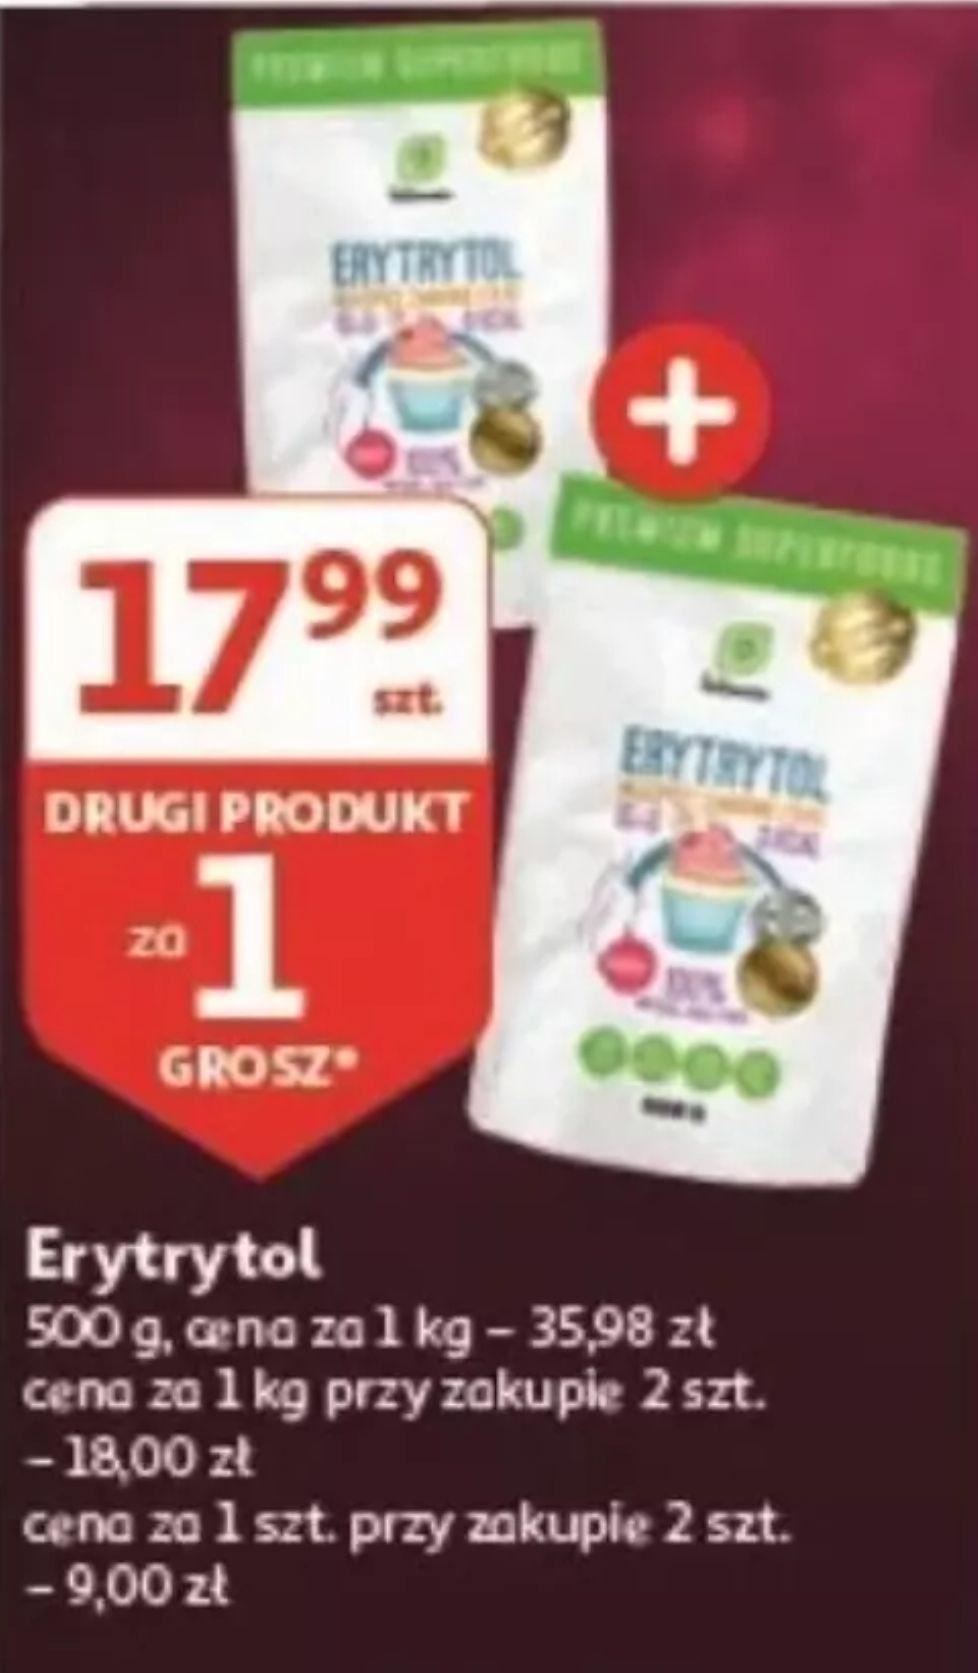 Auchan - Erytrytol 1kg - 18zł